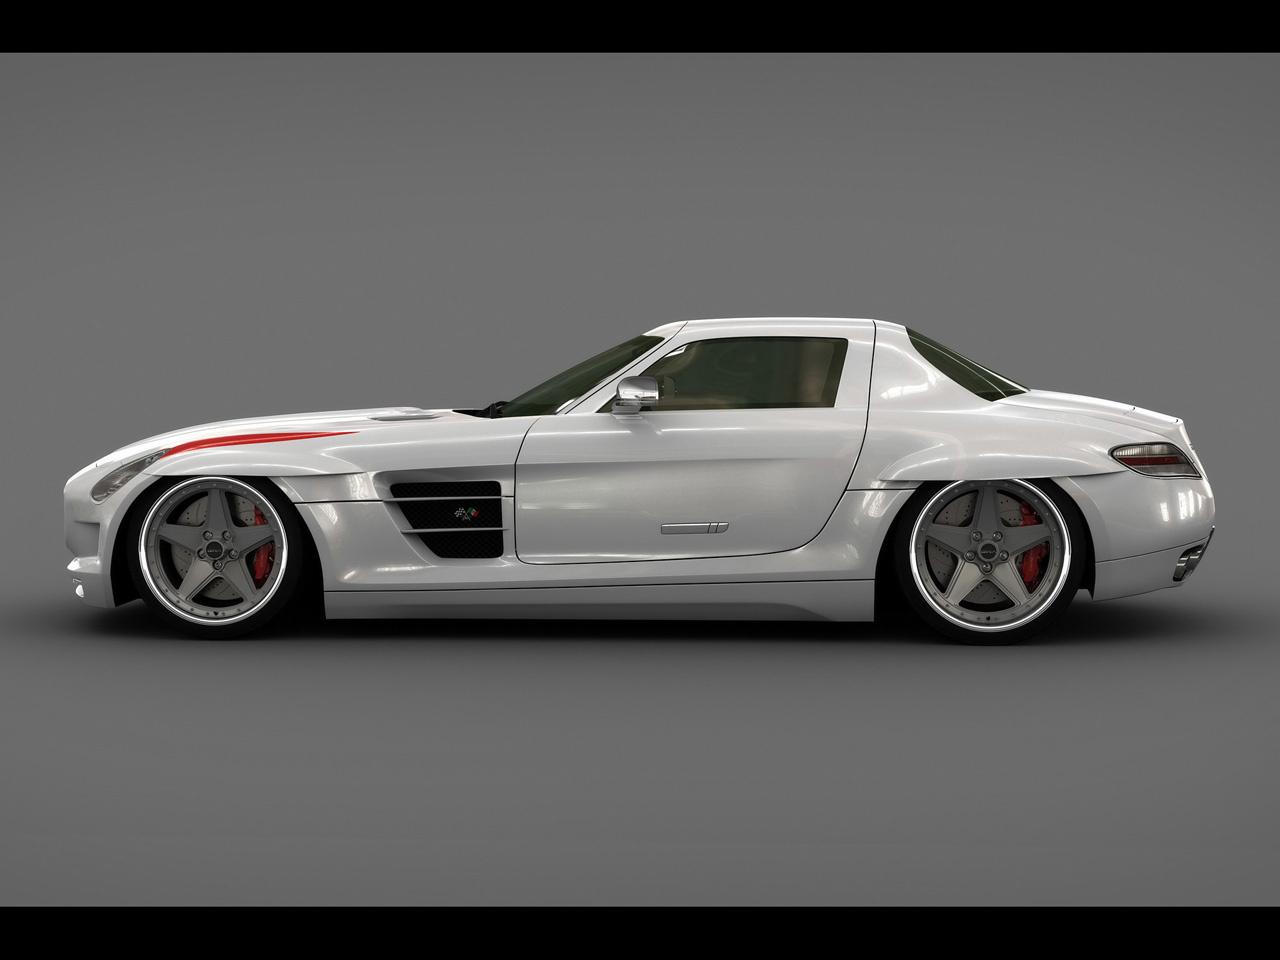 http://4.bp.blogspot.com/_Y5-4Z4aPcOI/TUm0l2hFtnI/AAAAAAAABY4/2sY7K4kOtlE/s1600/Mercedes_SLS_Panamericana.jpg